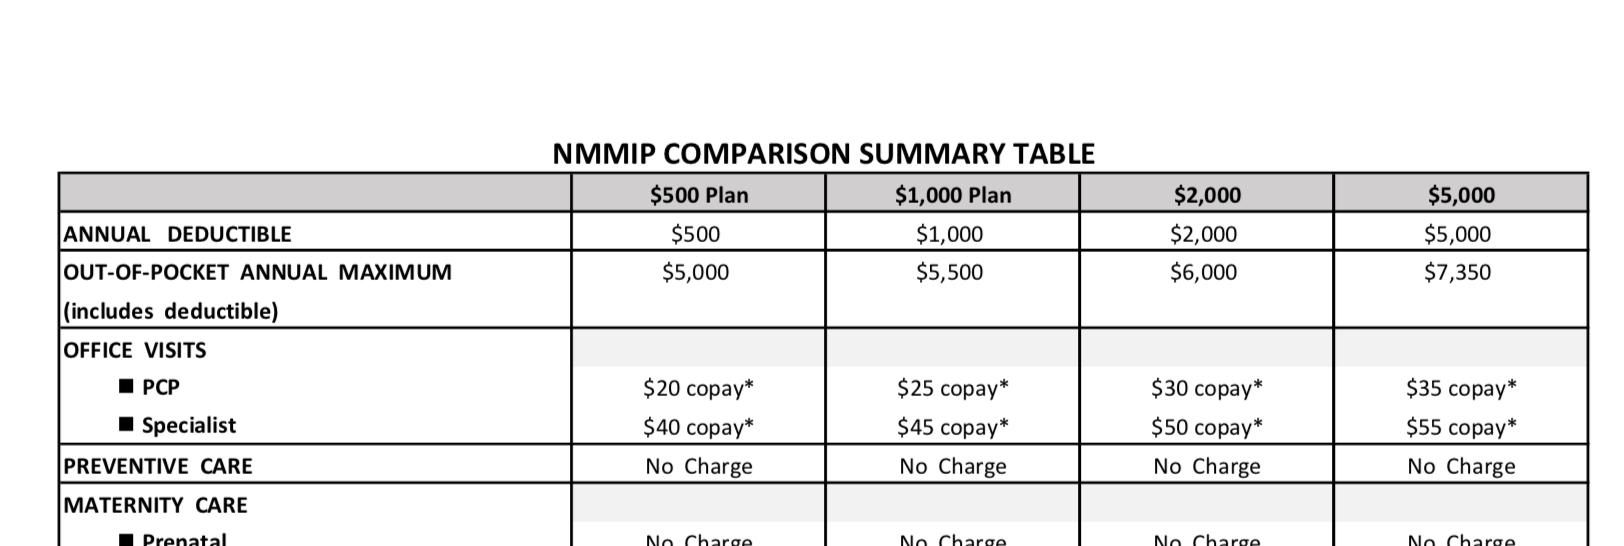 NMMIP Comparison Summary